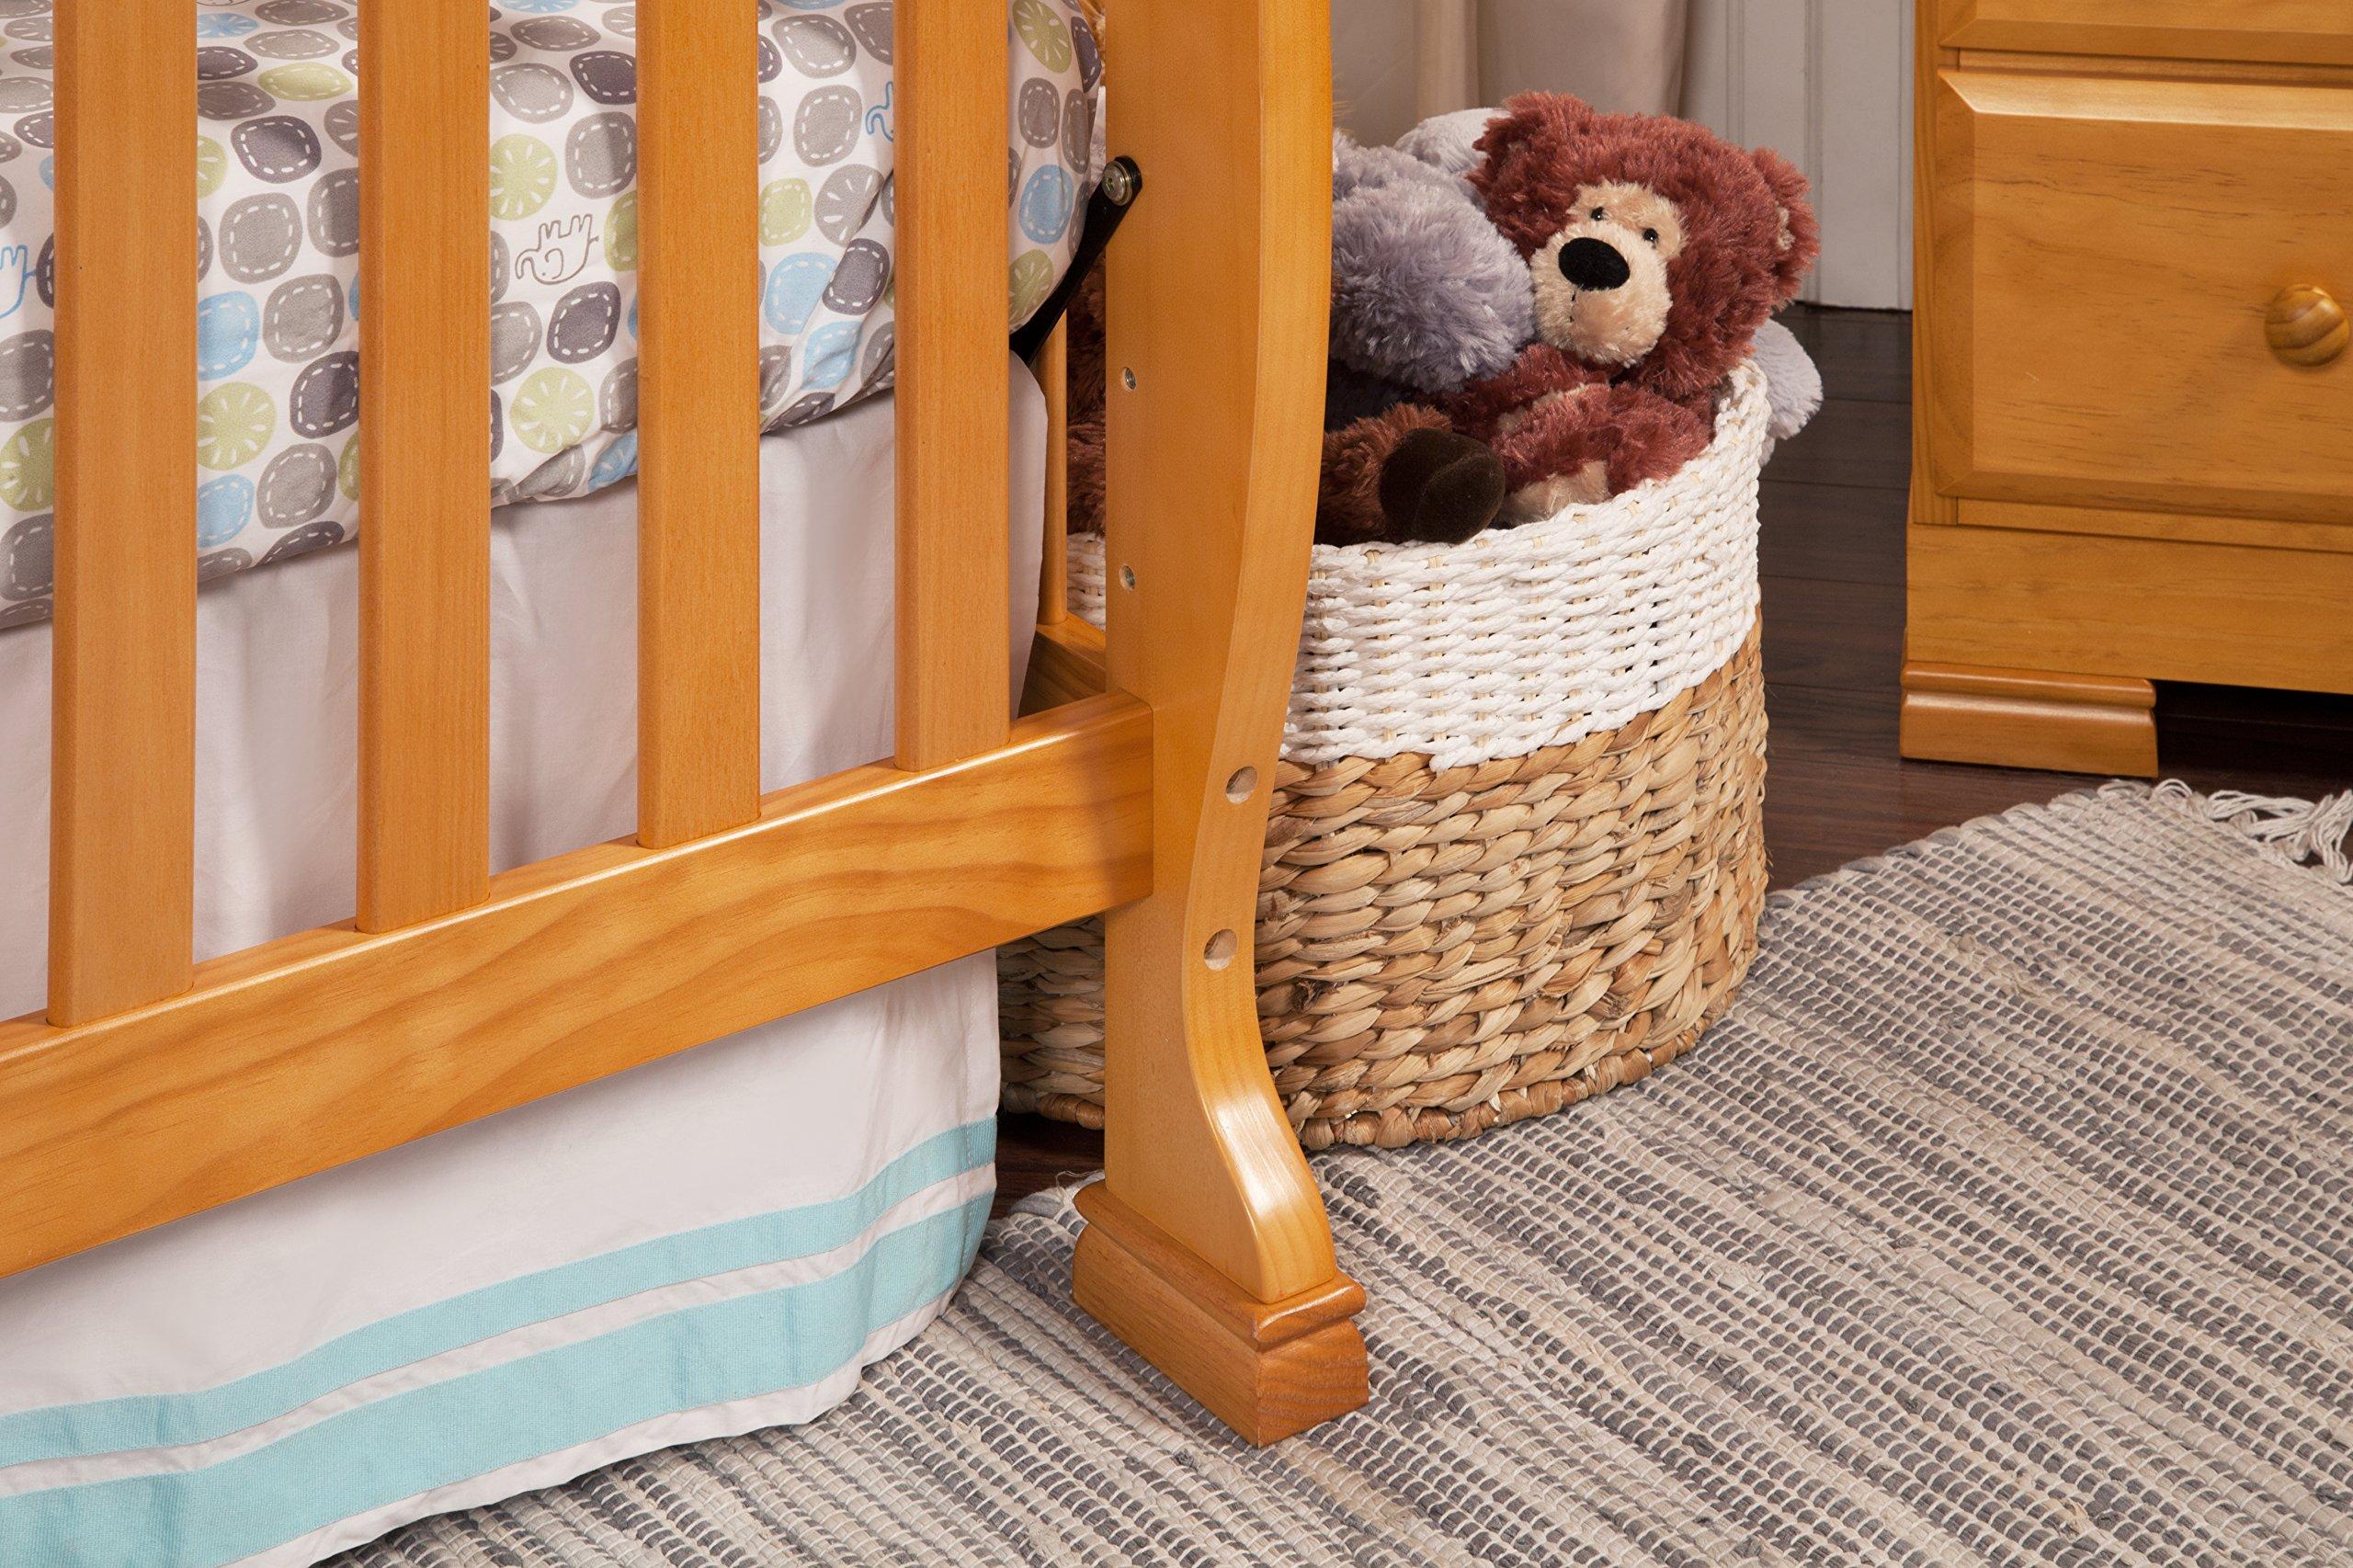 DaVinci Kalani 4-In-1 Convertible Crib, Honey Oak by DaVinci (Image #6)